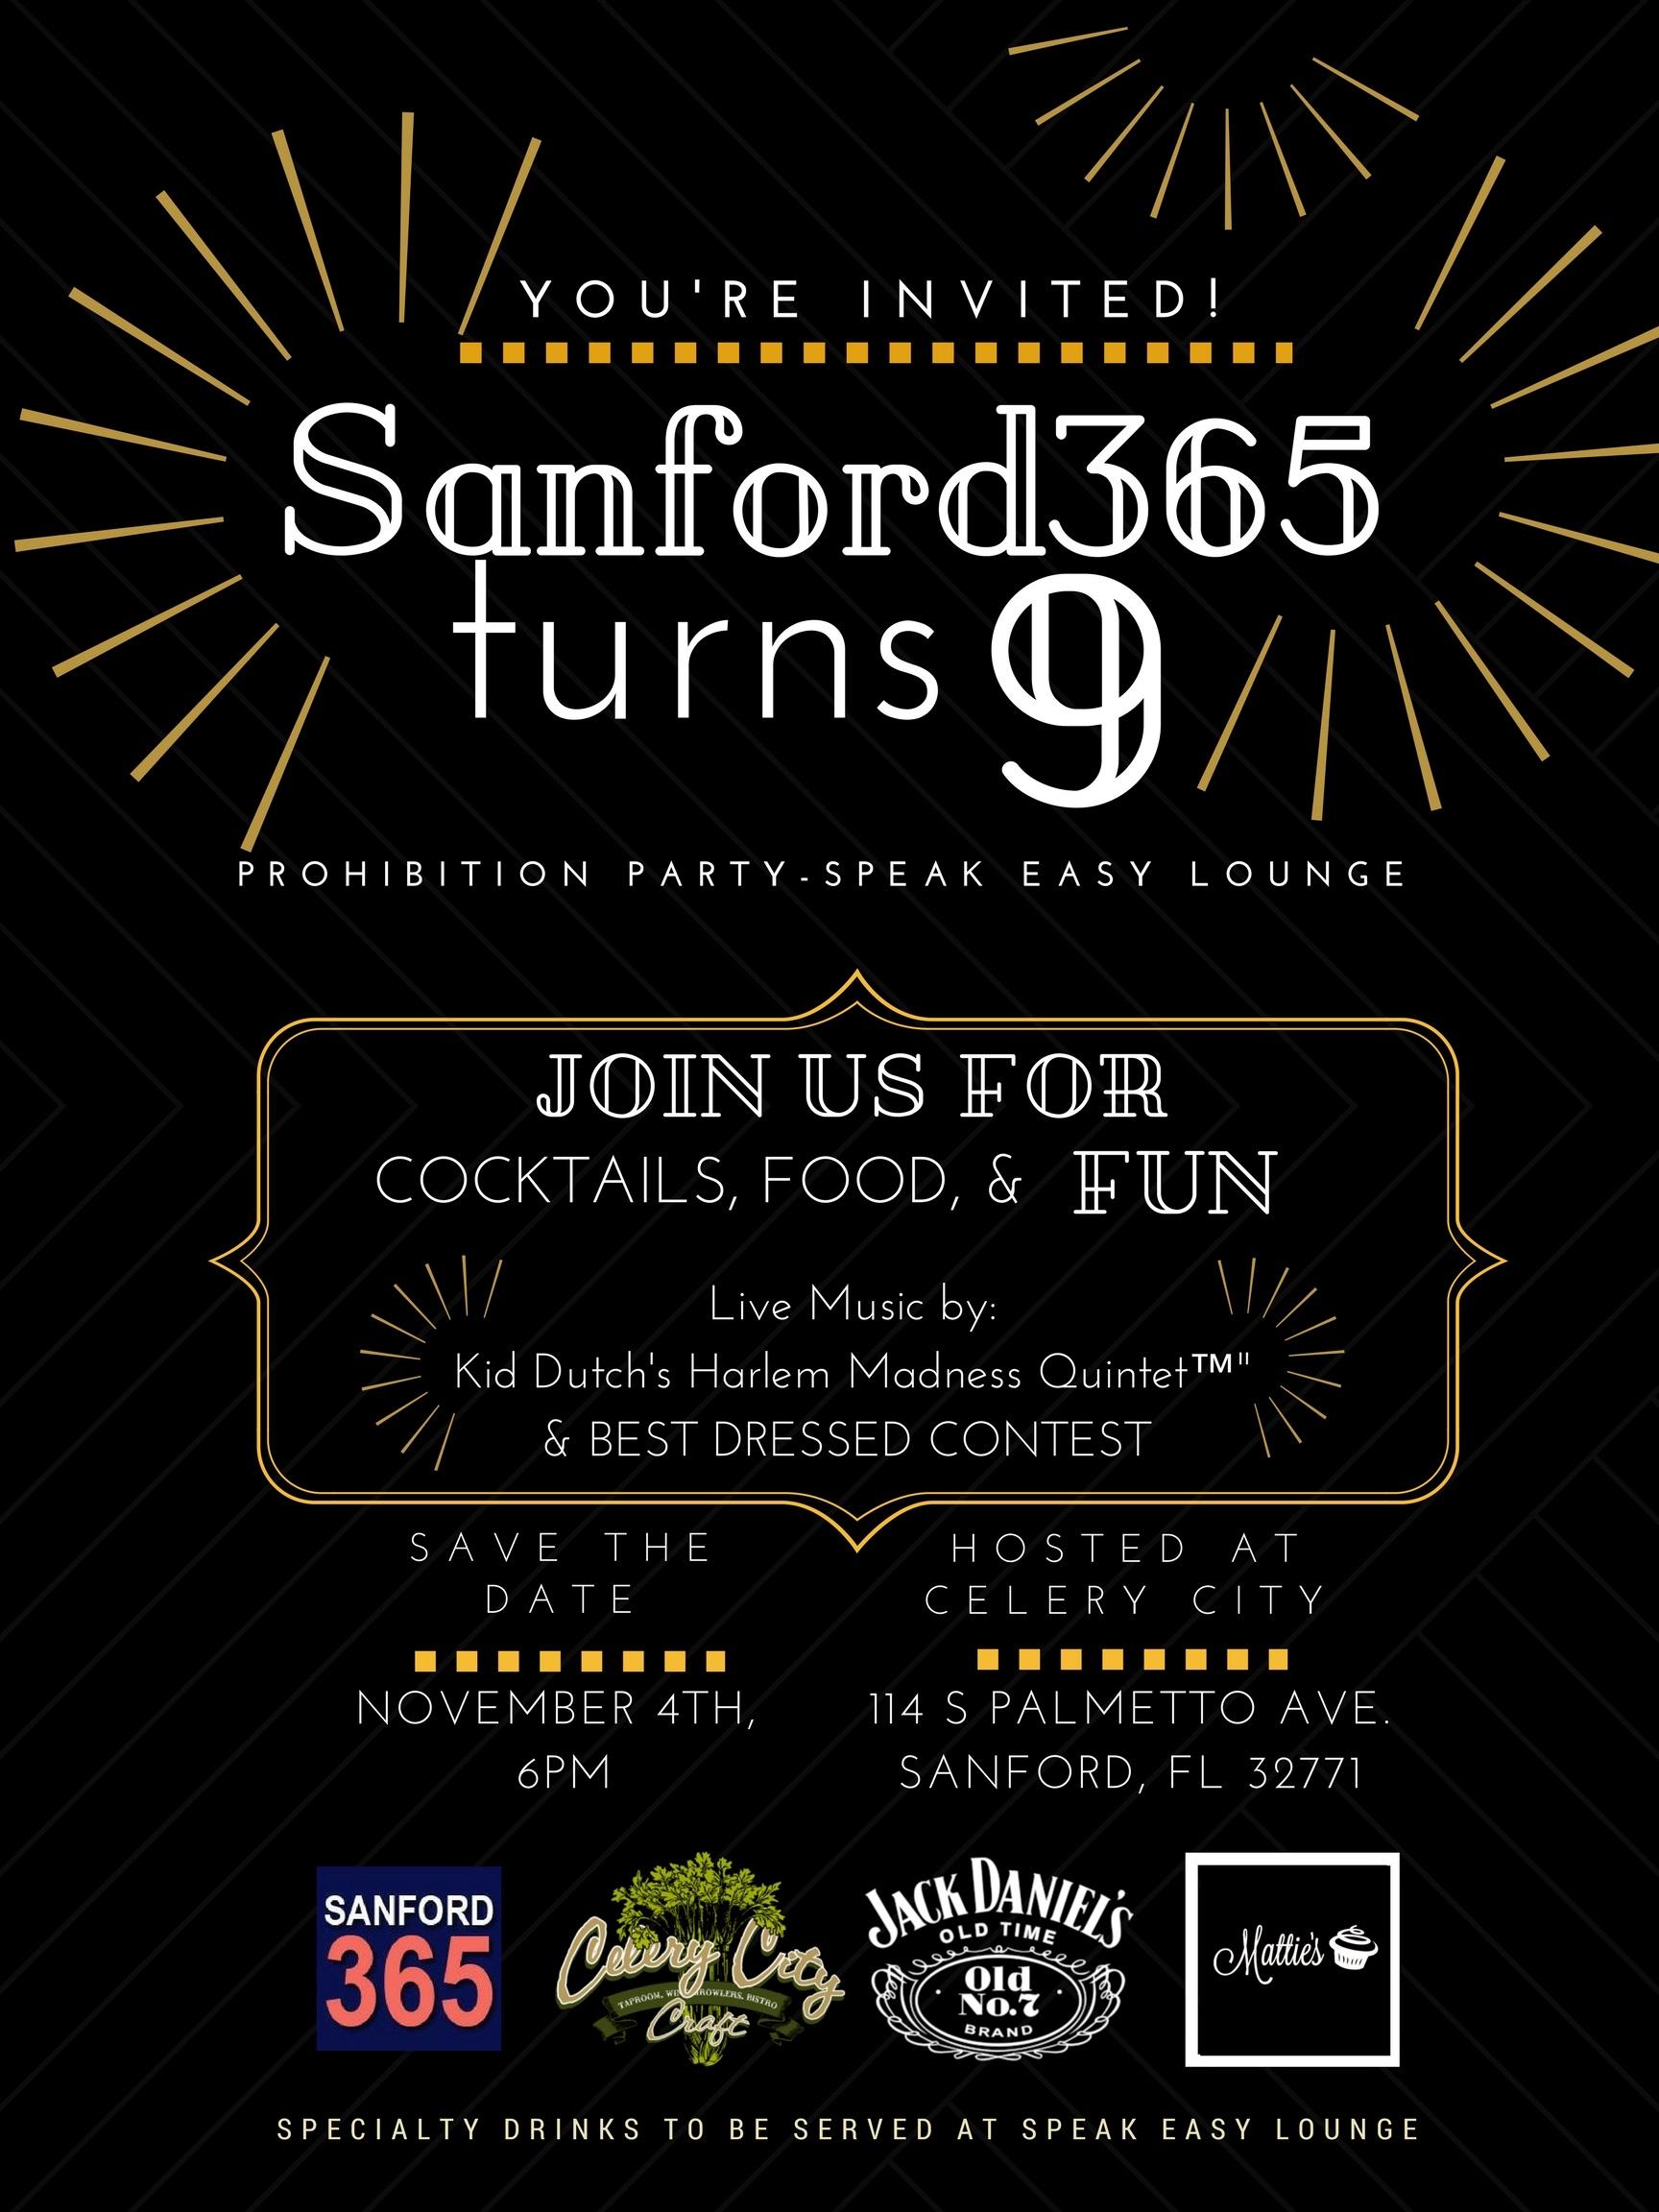 Sanford365 turns 9! Prohibition Party – Speak Easy Lounge